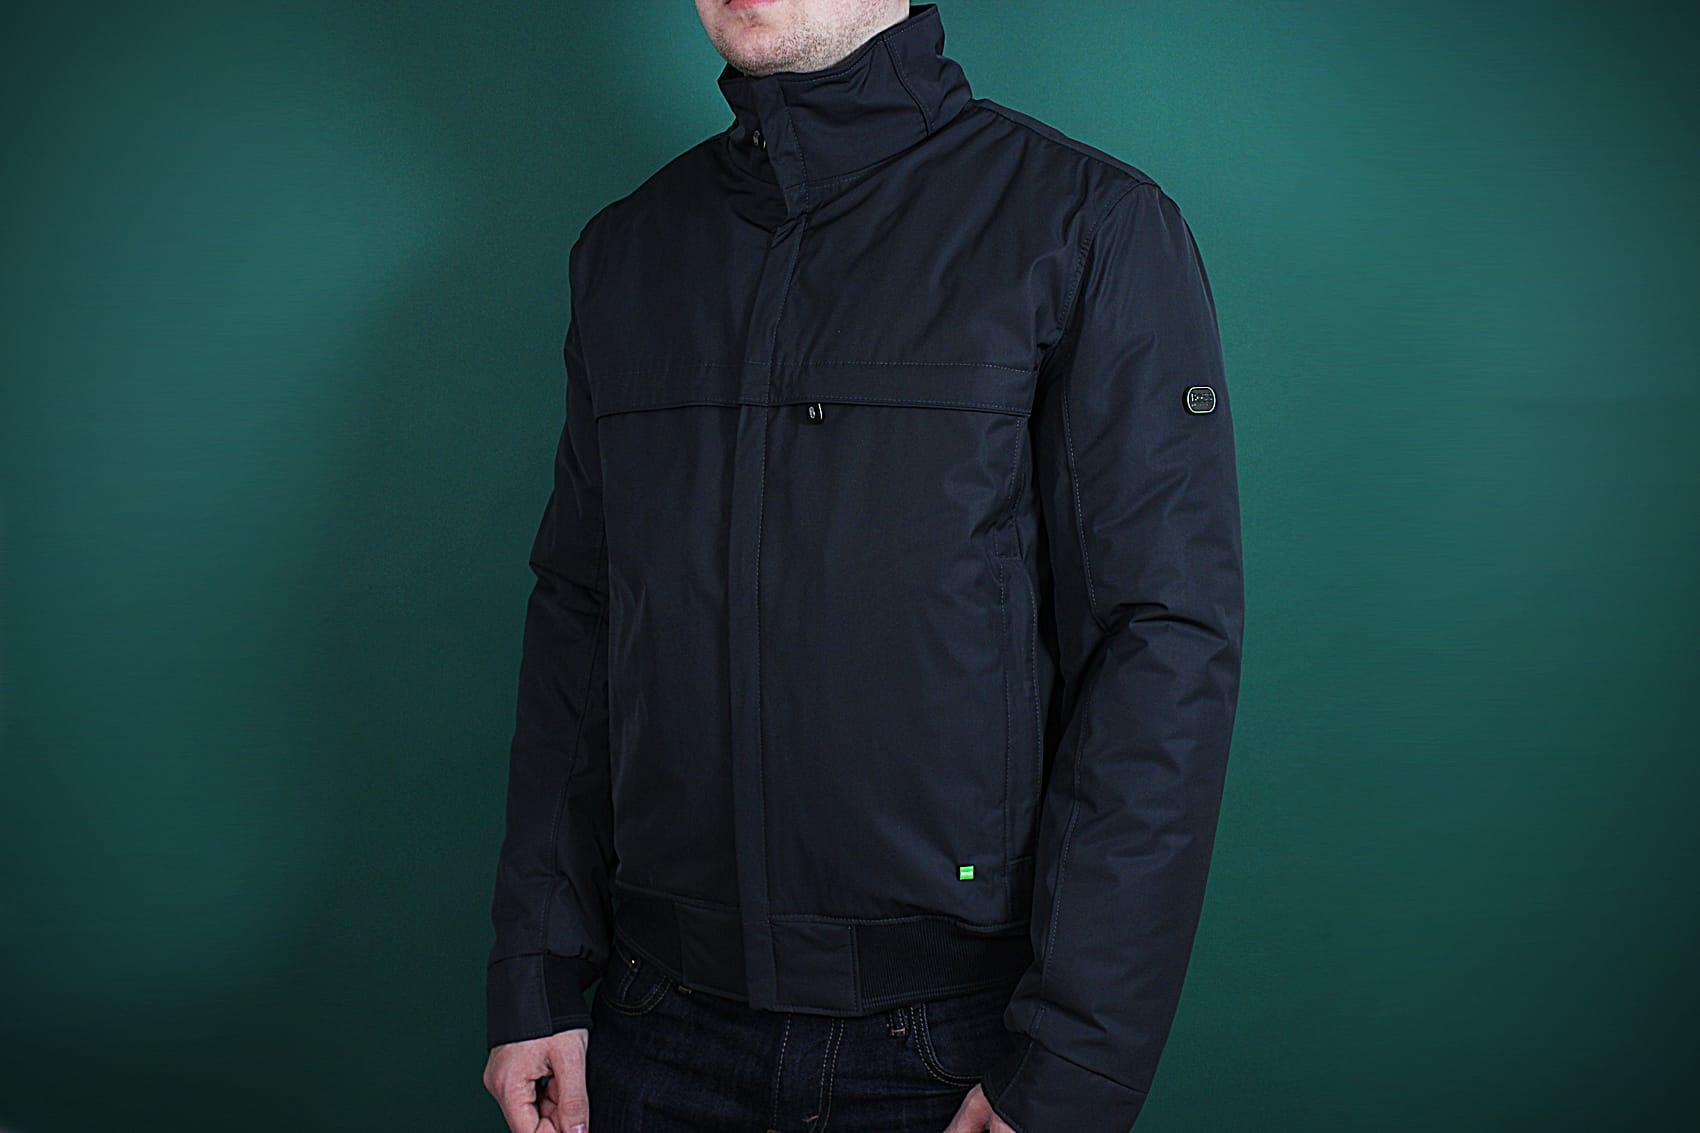 new arrivals hugo boss green jackets northern threads. Black Bedroom Furniture Sets. Home Design Ideas